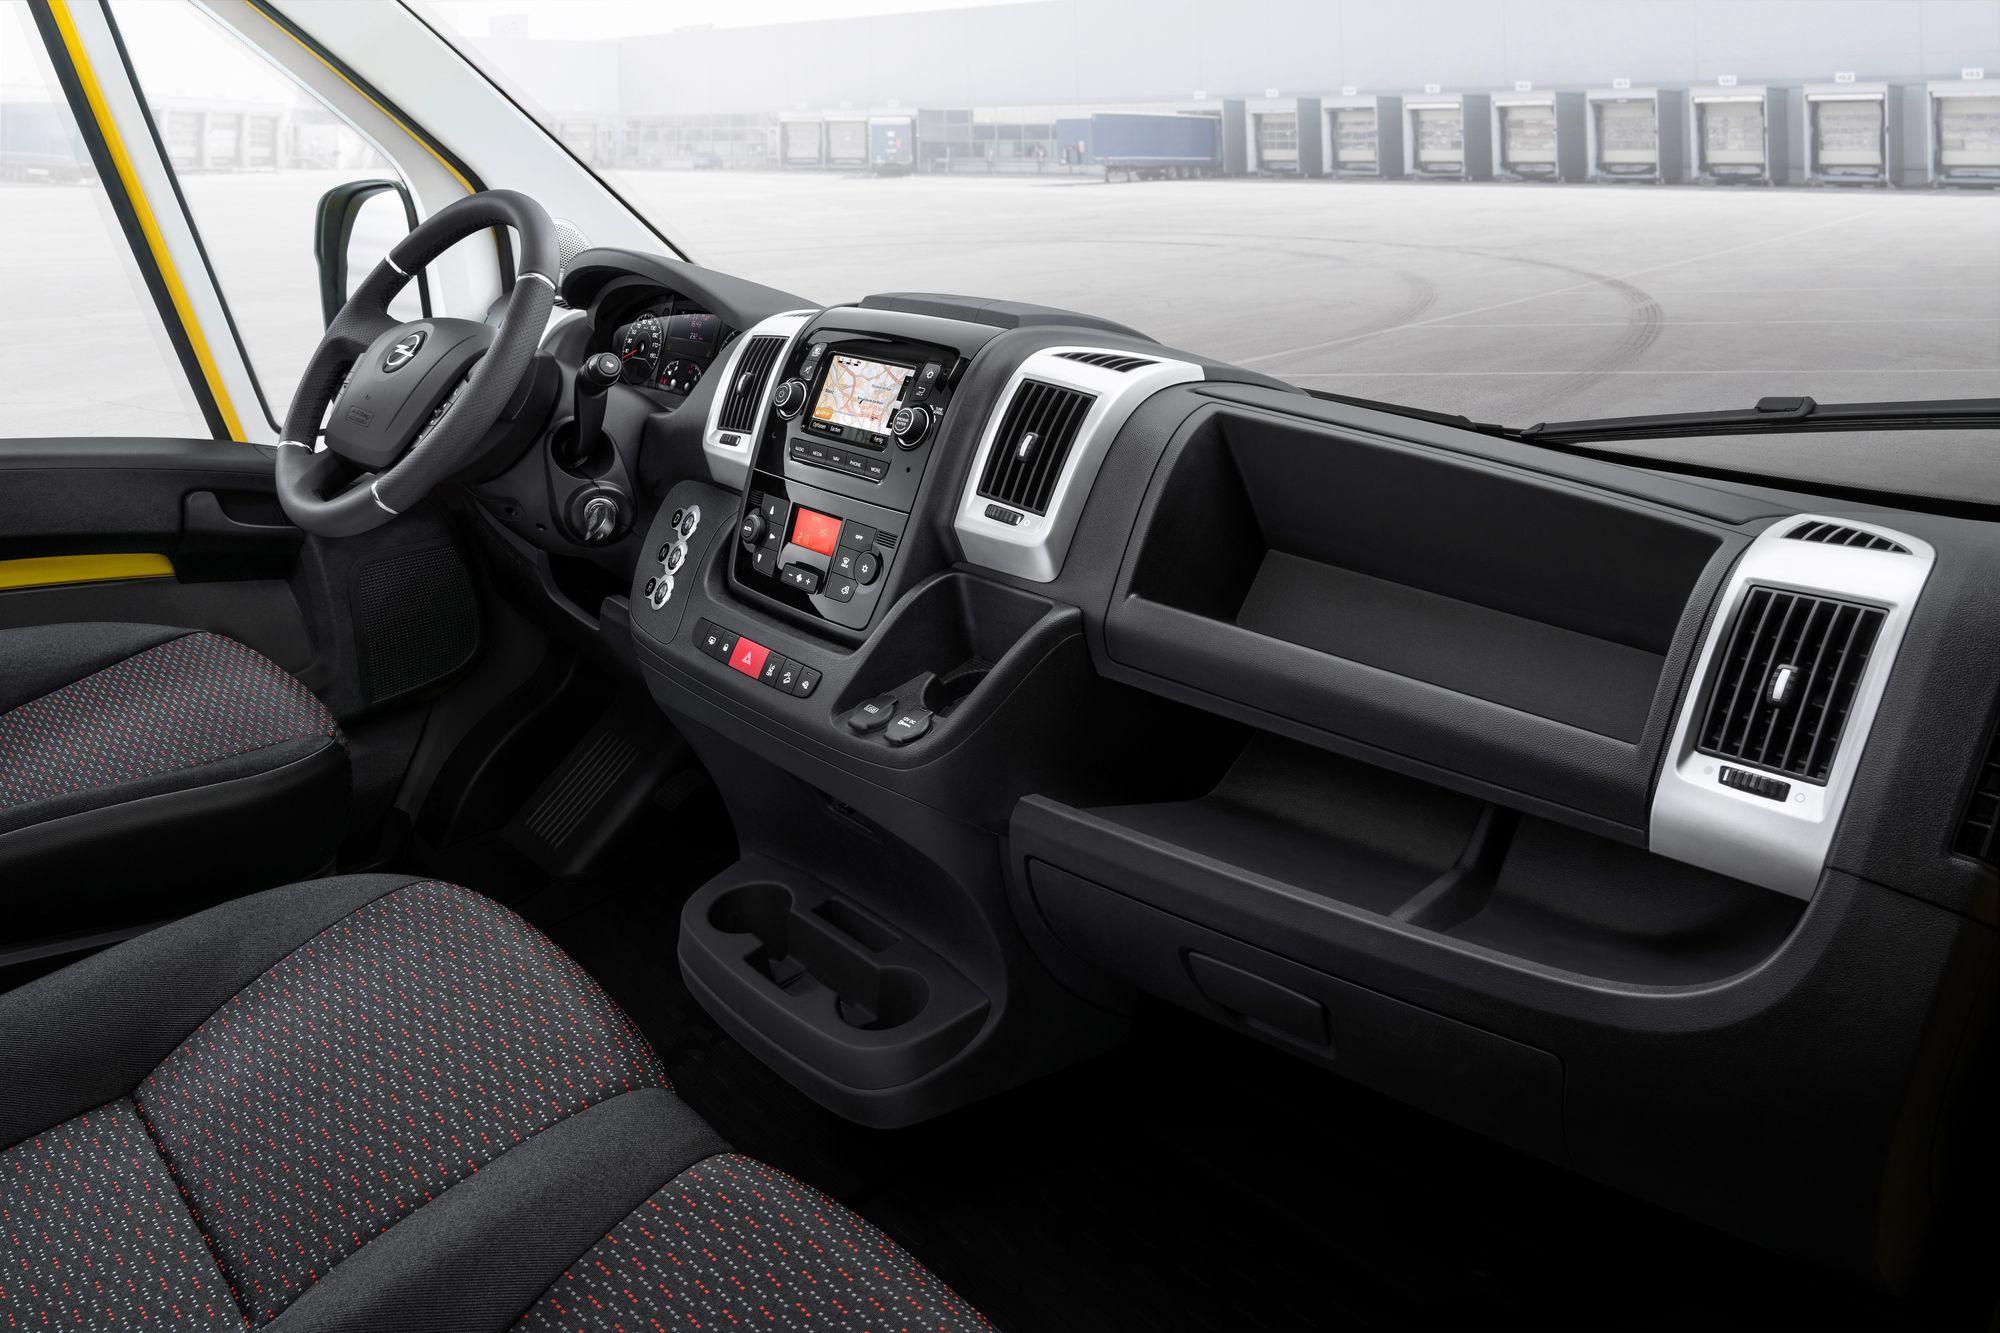 Электрический Movano-e увенчал линейку фургонов Опеля